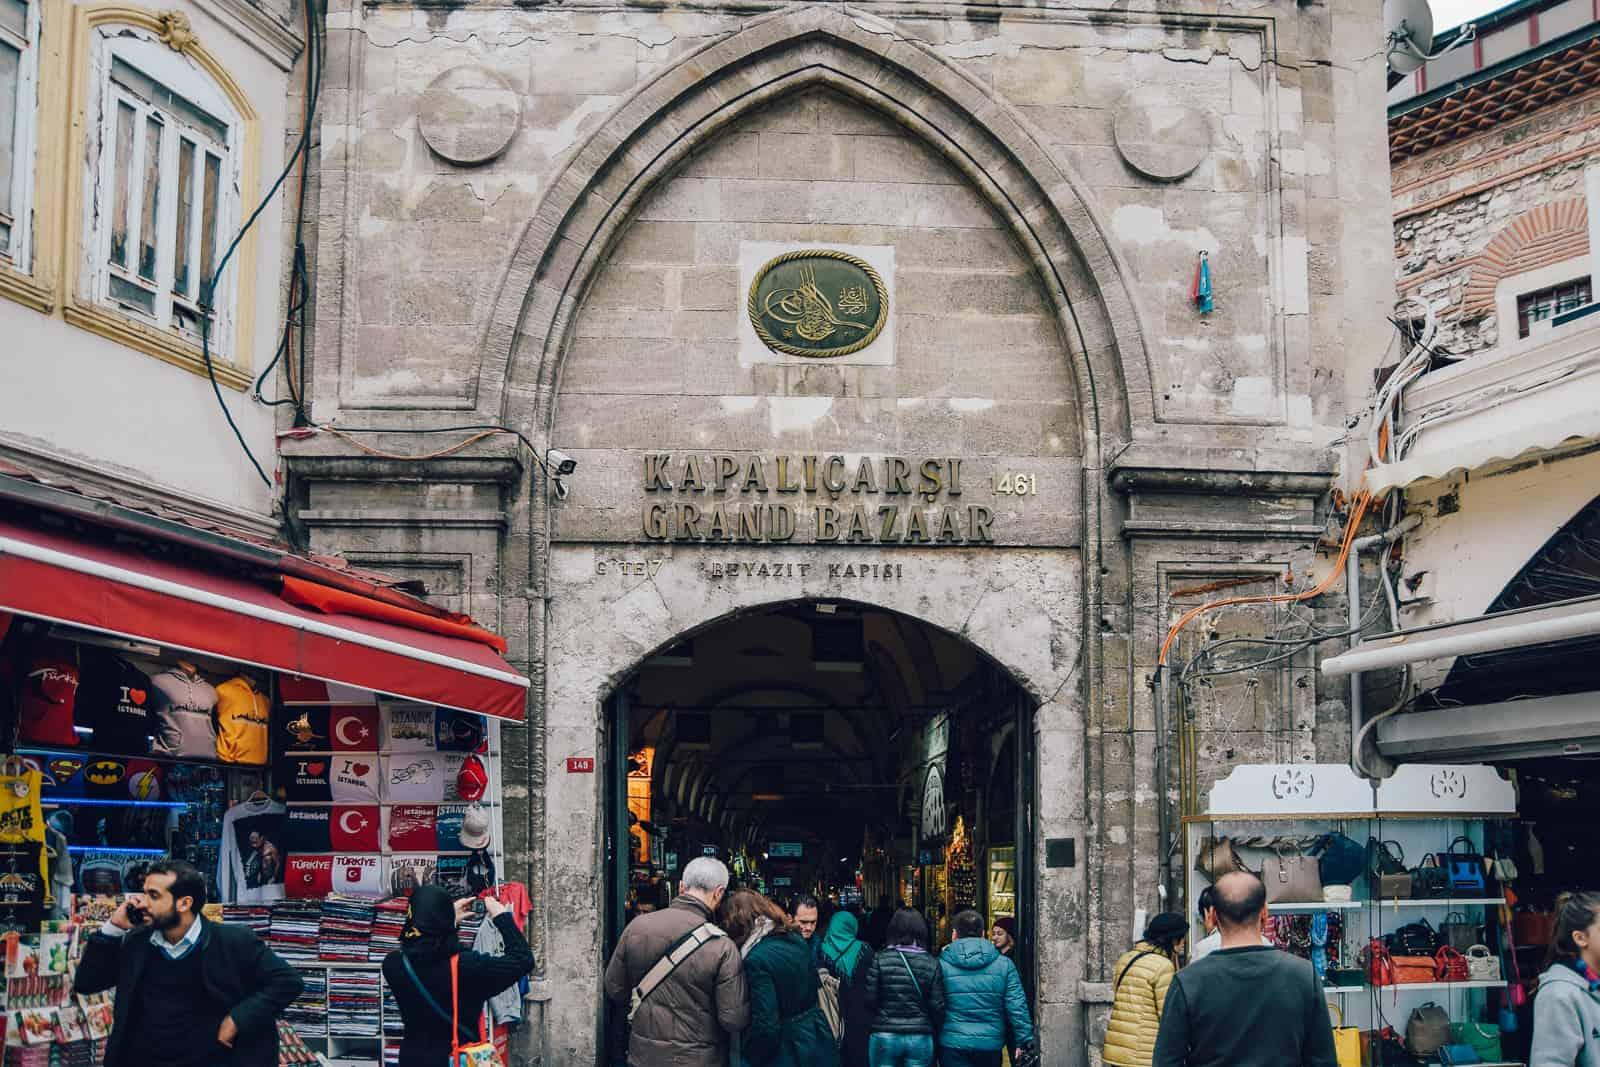 Grand Bazaar Beyazit Gate